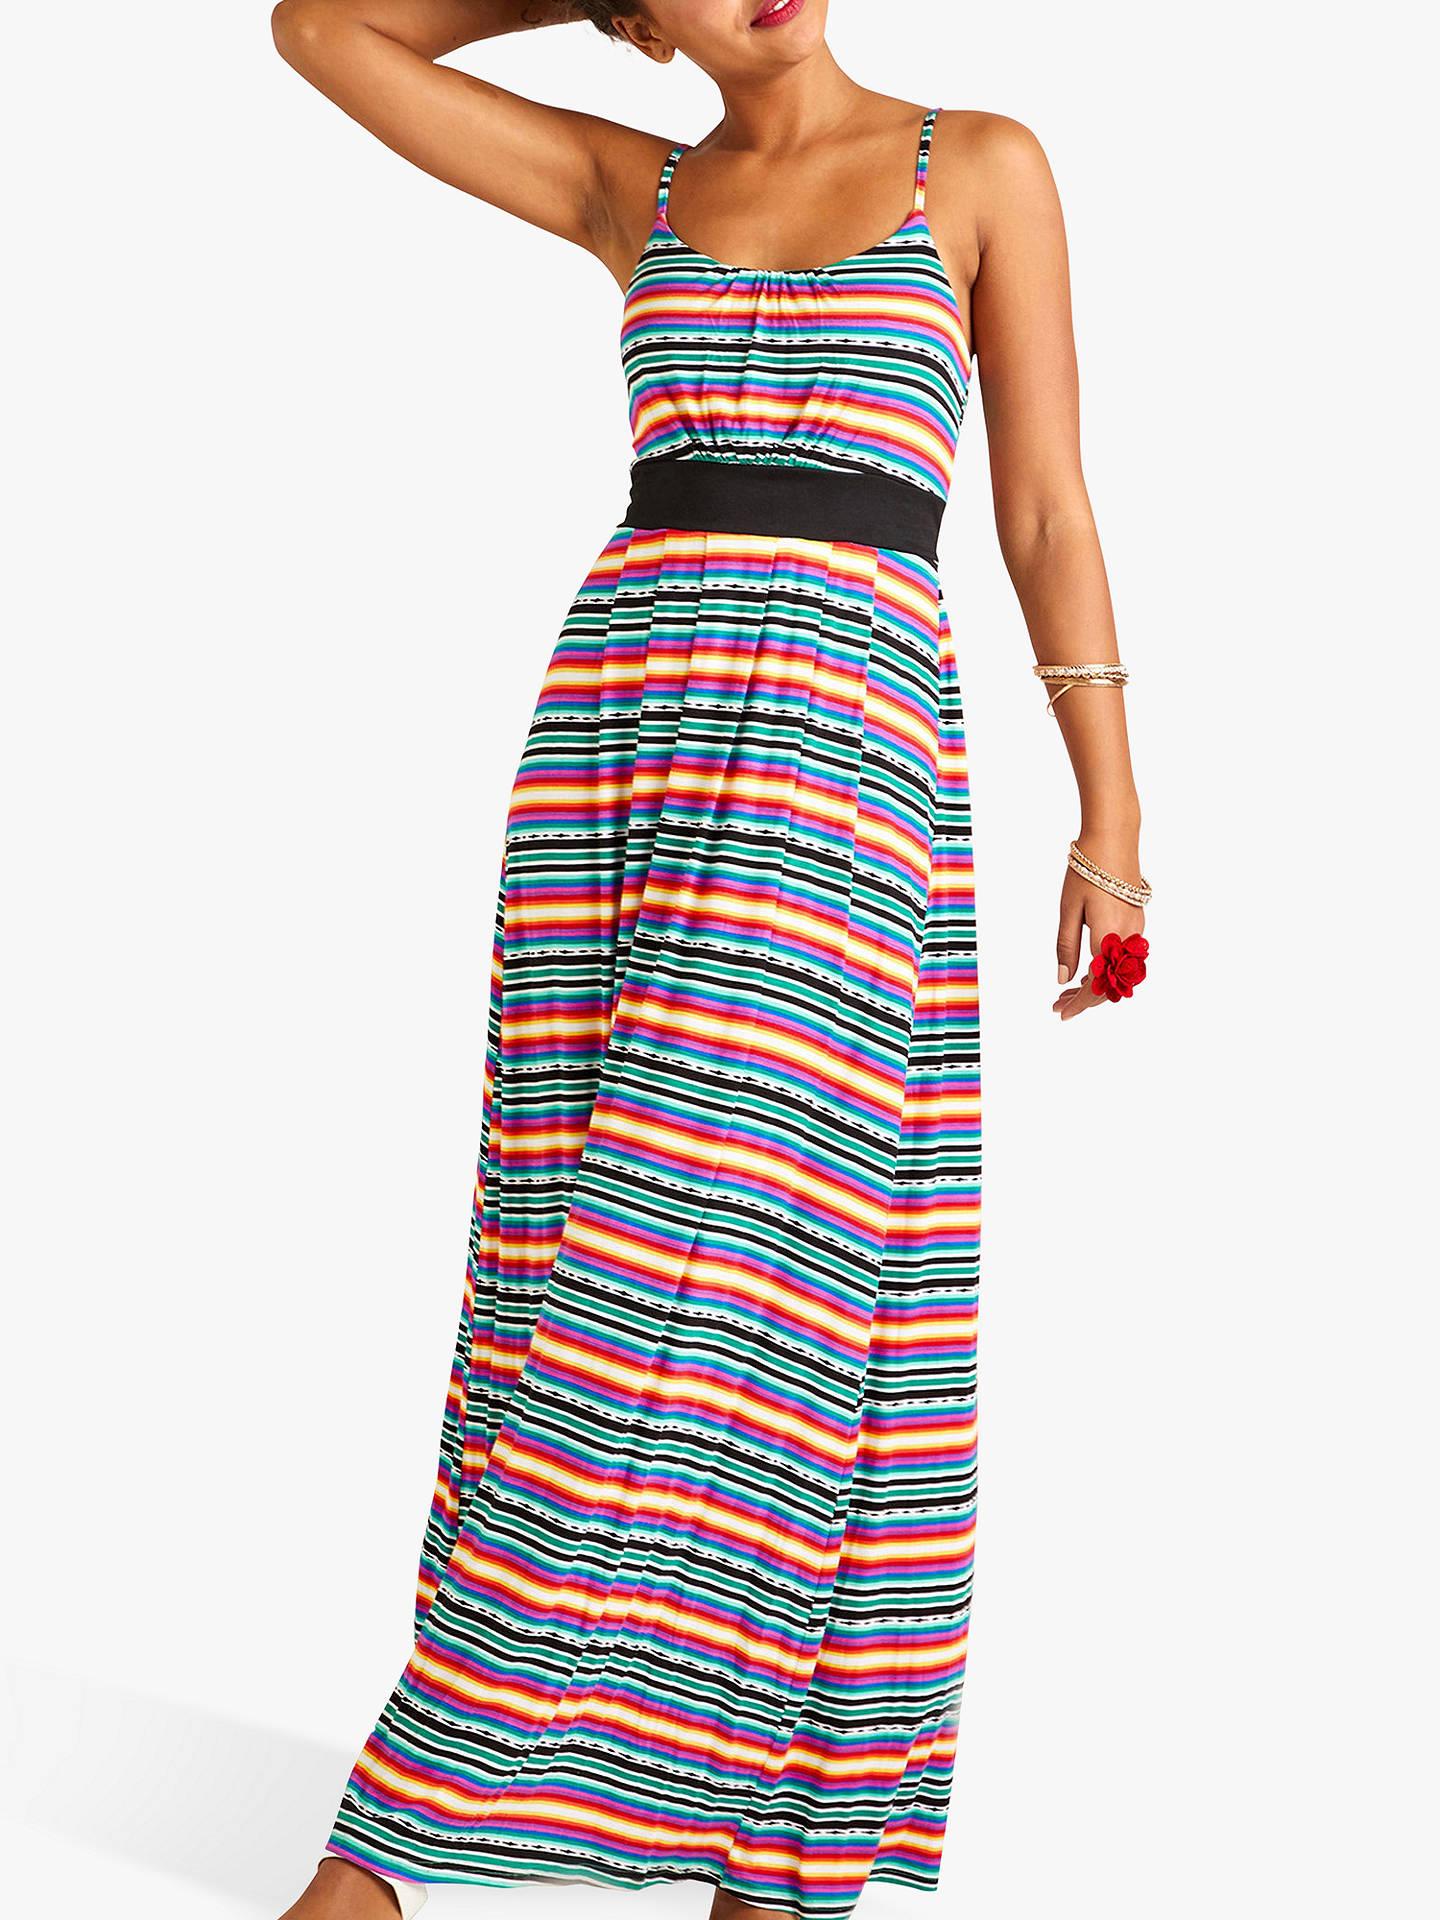 55ff5006ce9 Buy Yumi Mexican Jersey Stripe Maxi Dress